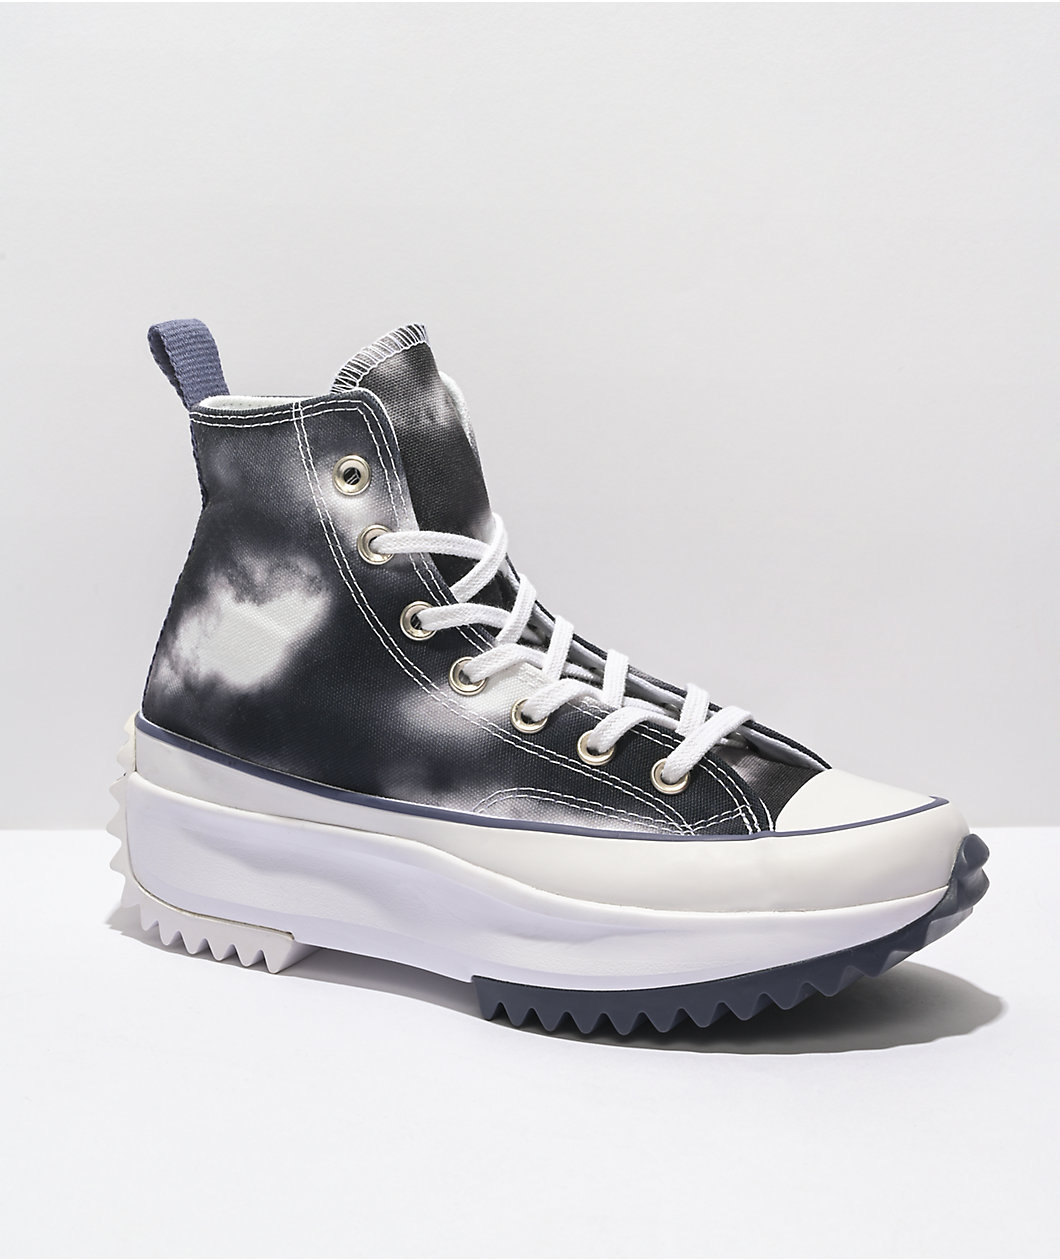 Converse Run Star Hike Cloud Dye Black & White Shoes